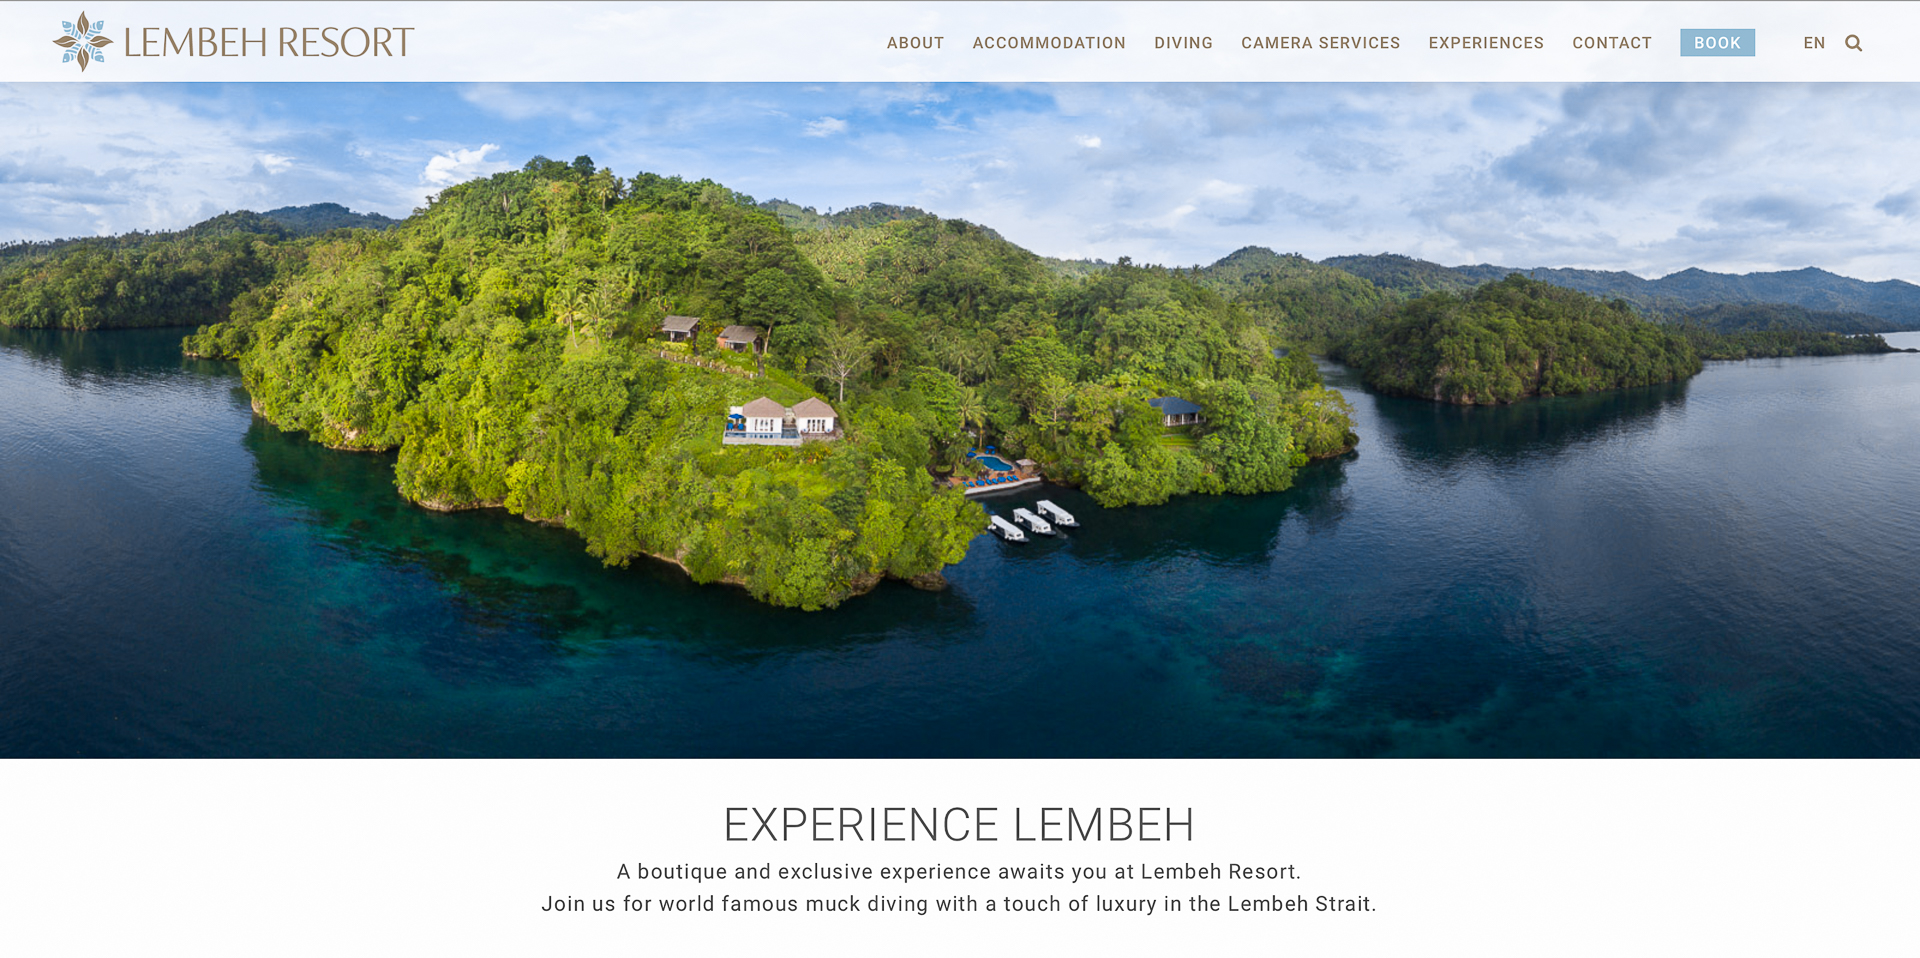 Newmediasoup-Lembeh-Resort-Home-Page